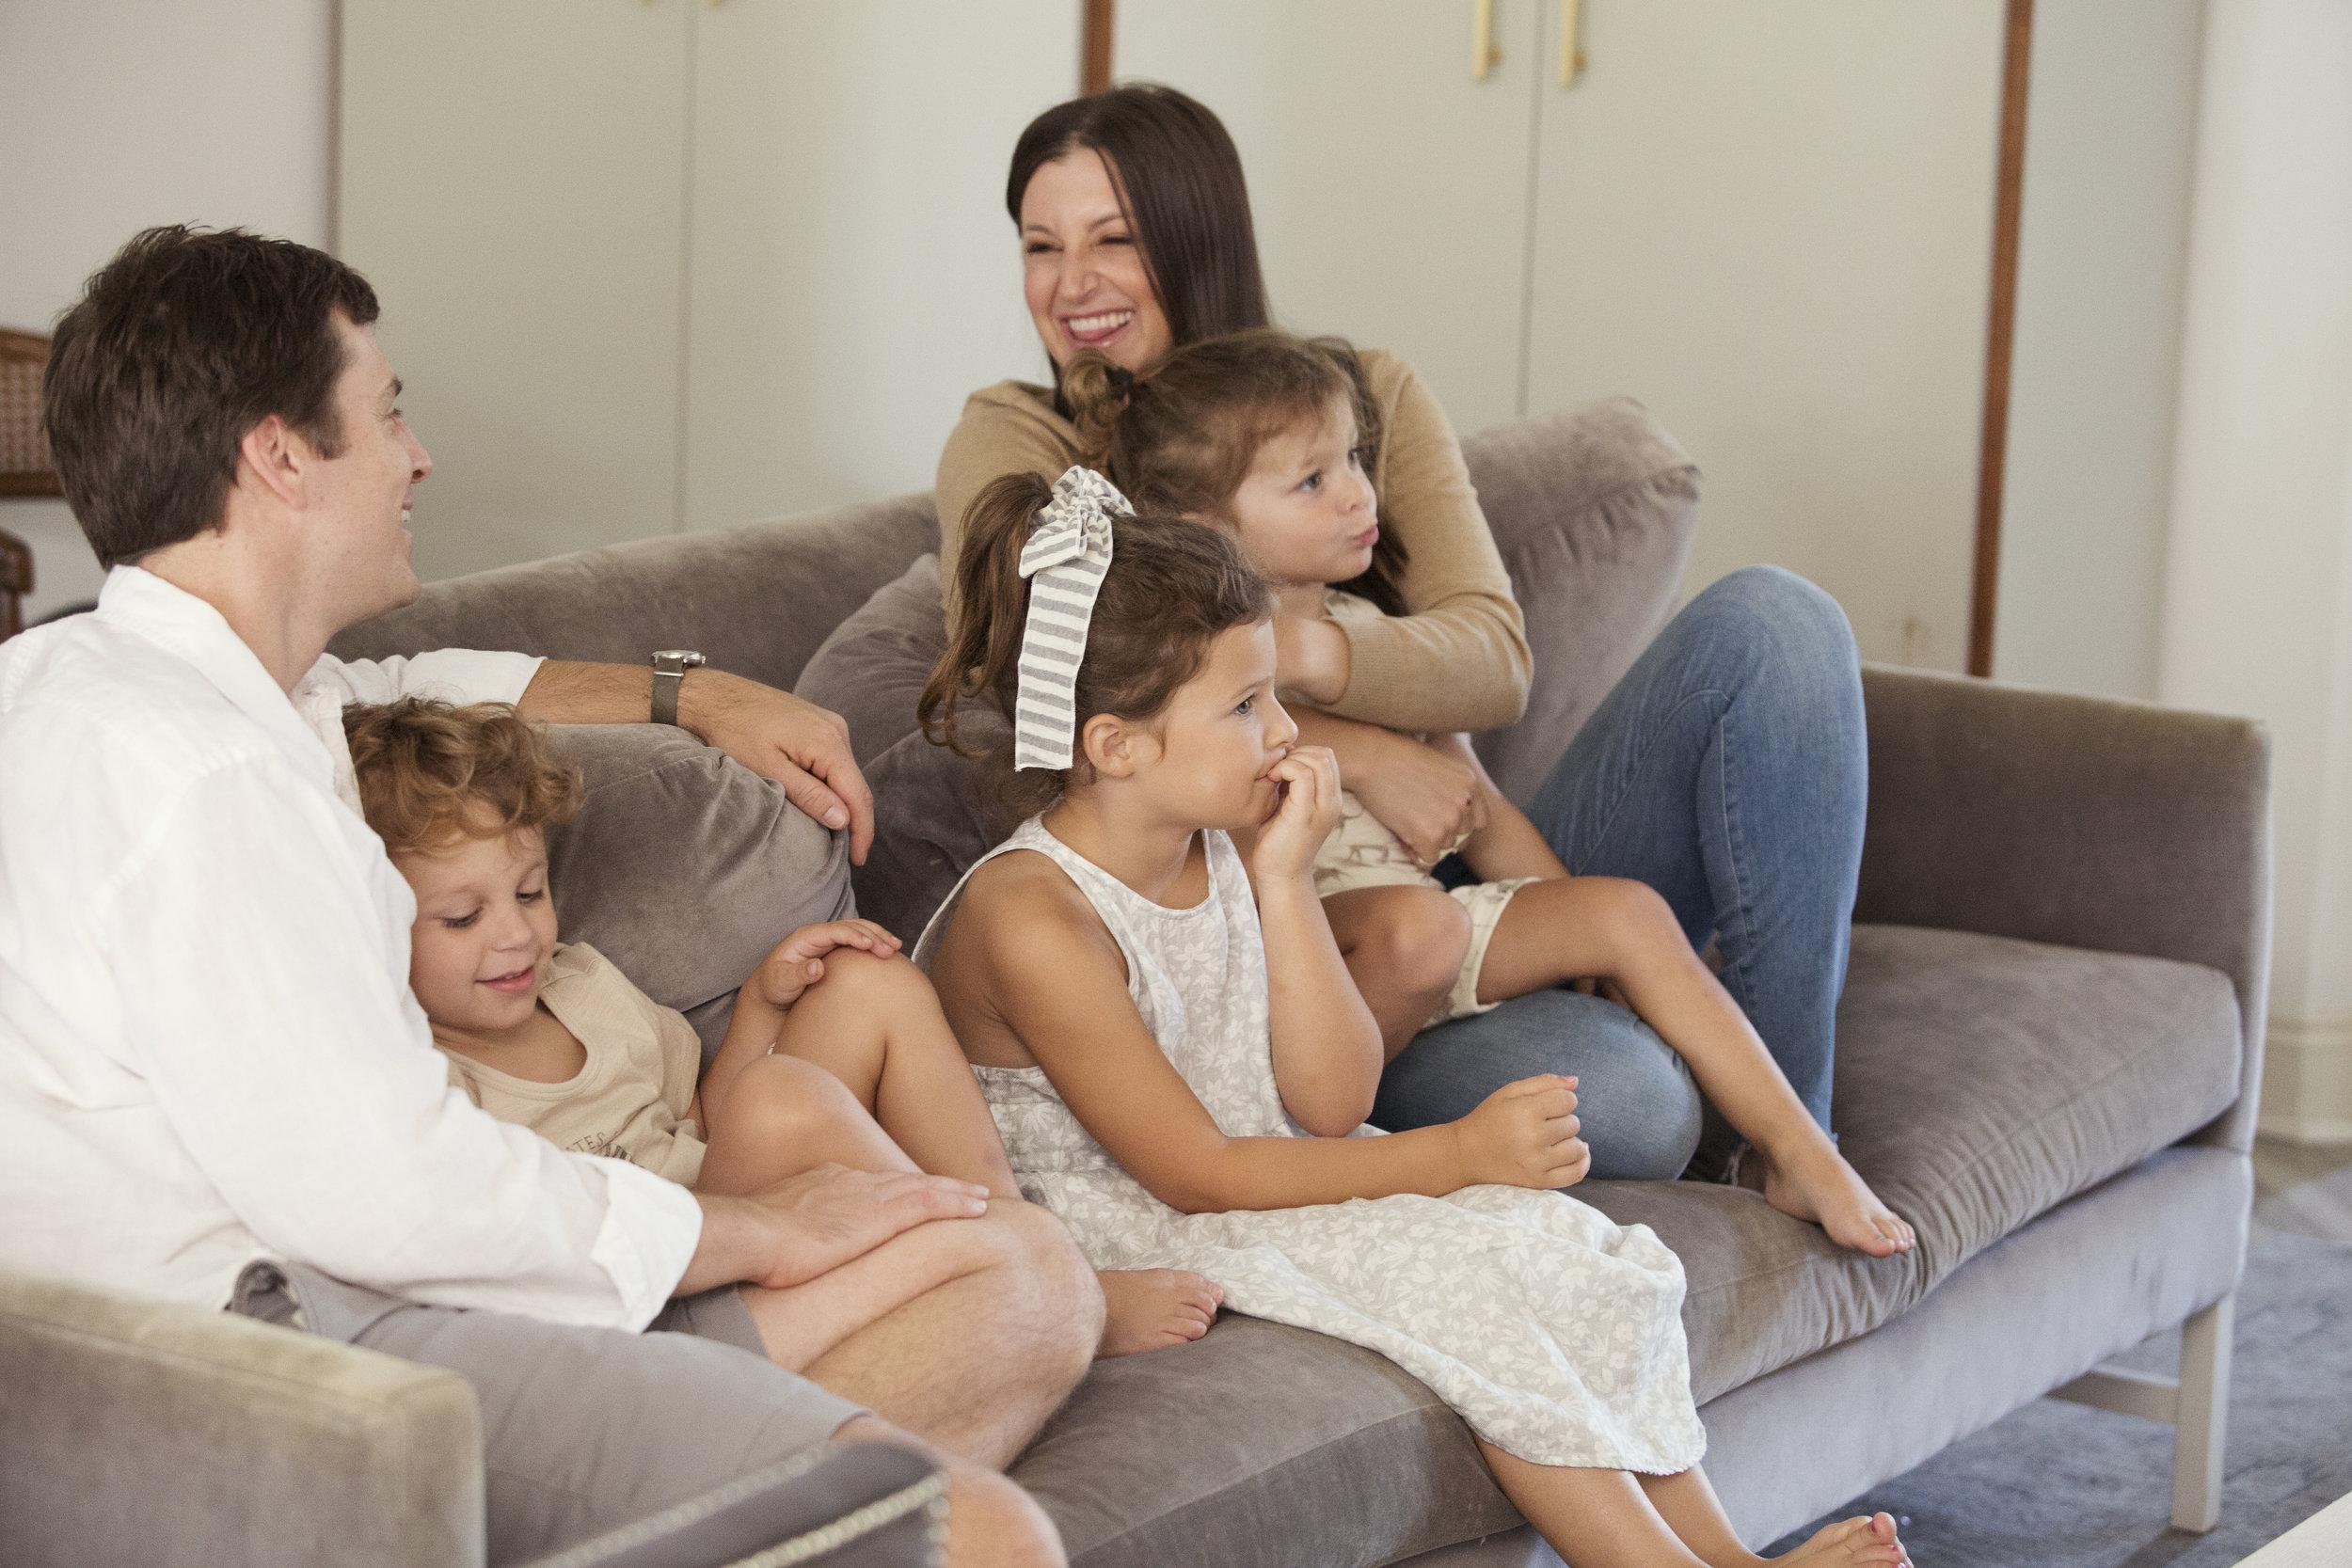 jessica-zimmerman-events-twin-mom-professional-education.jpg